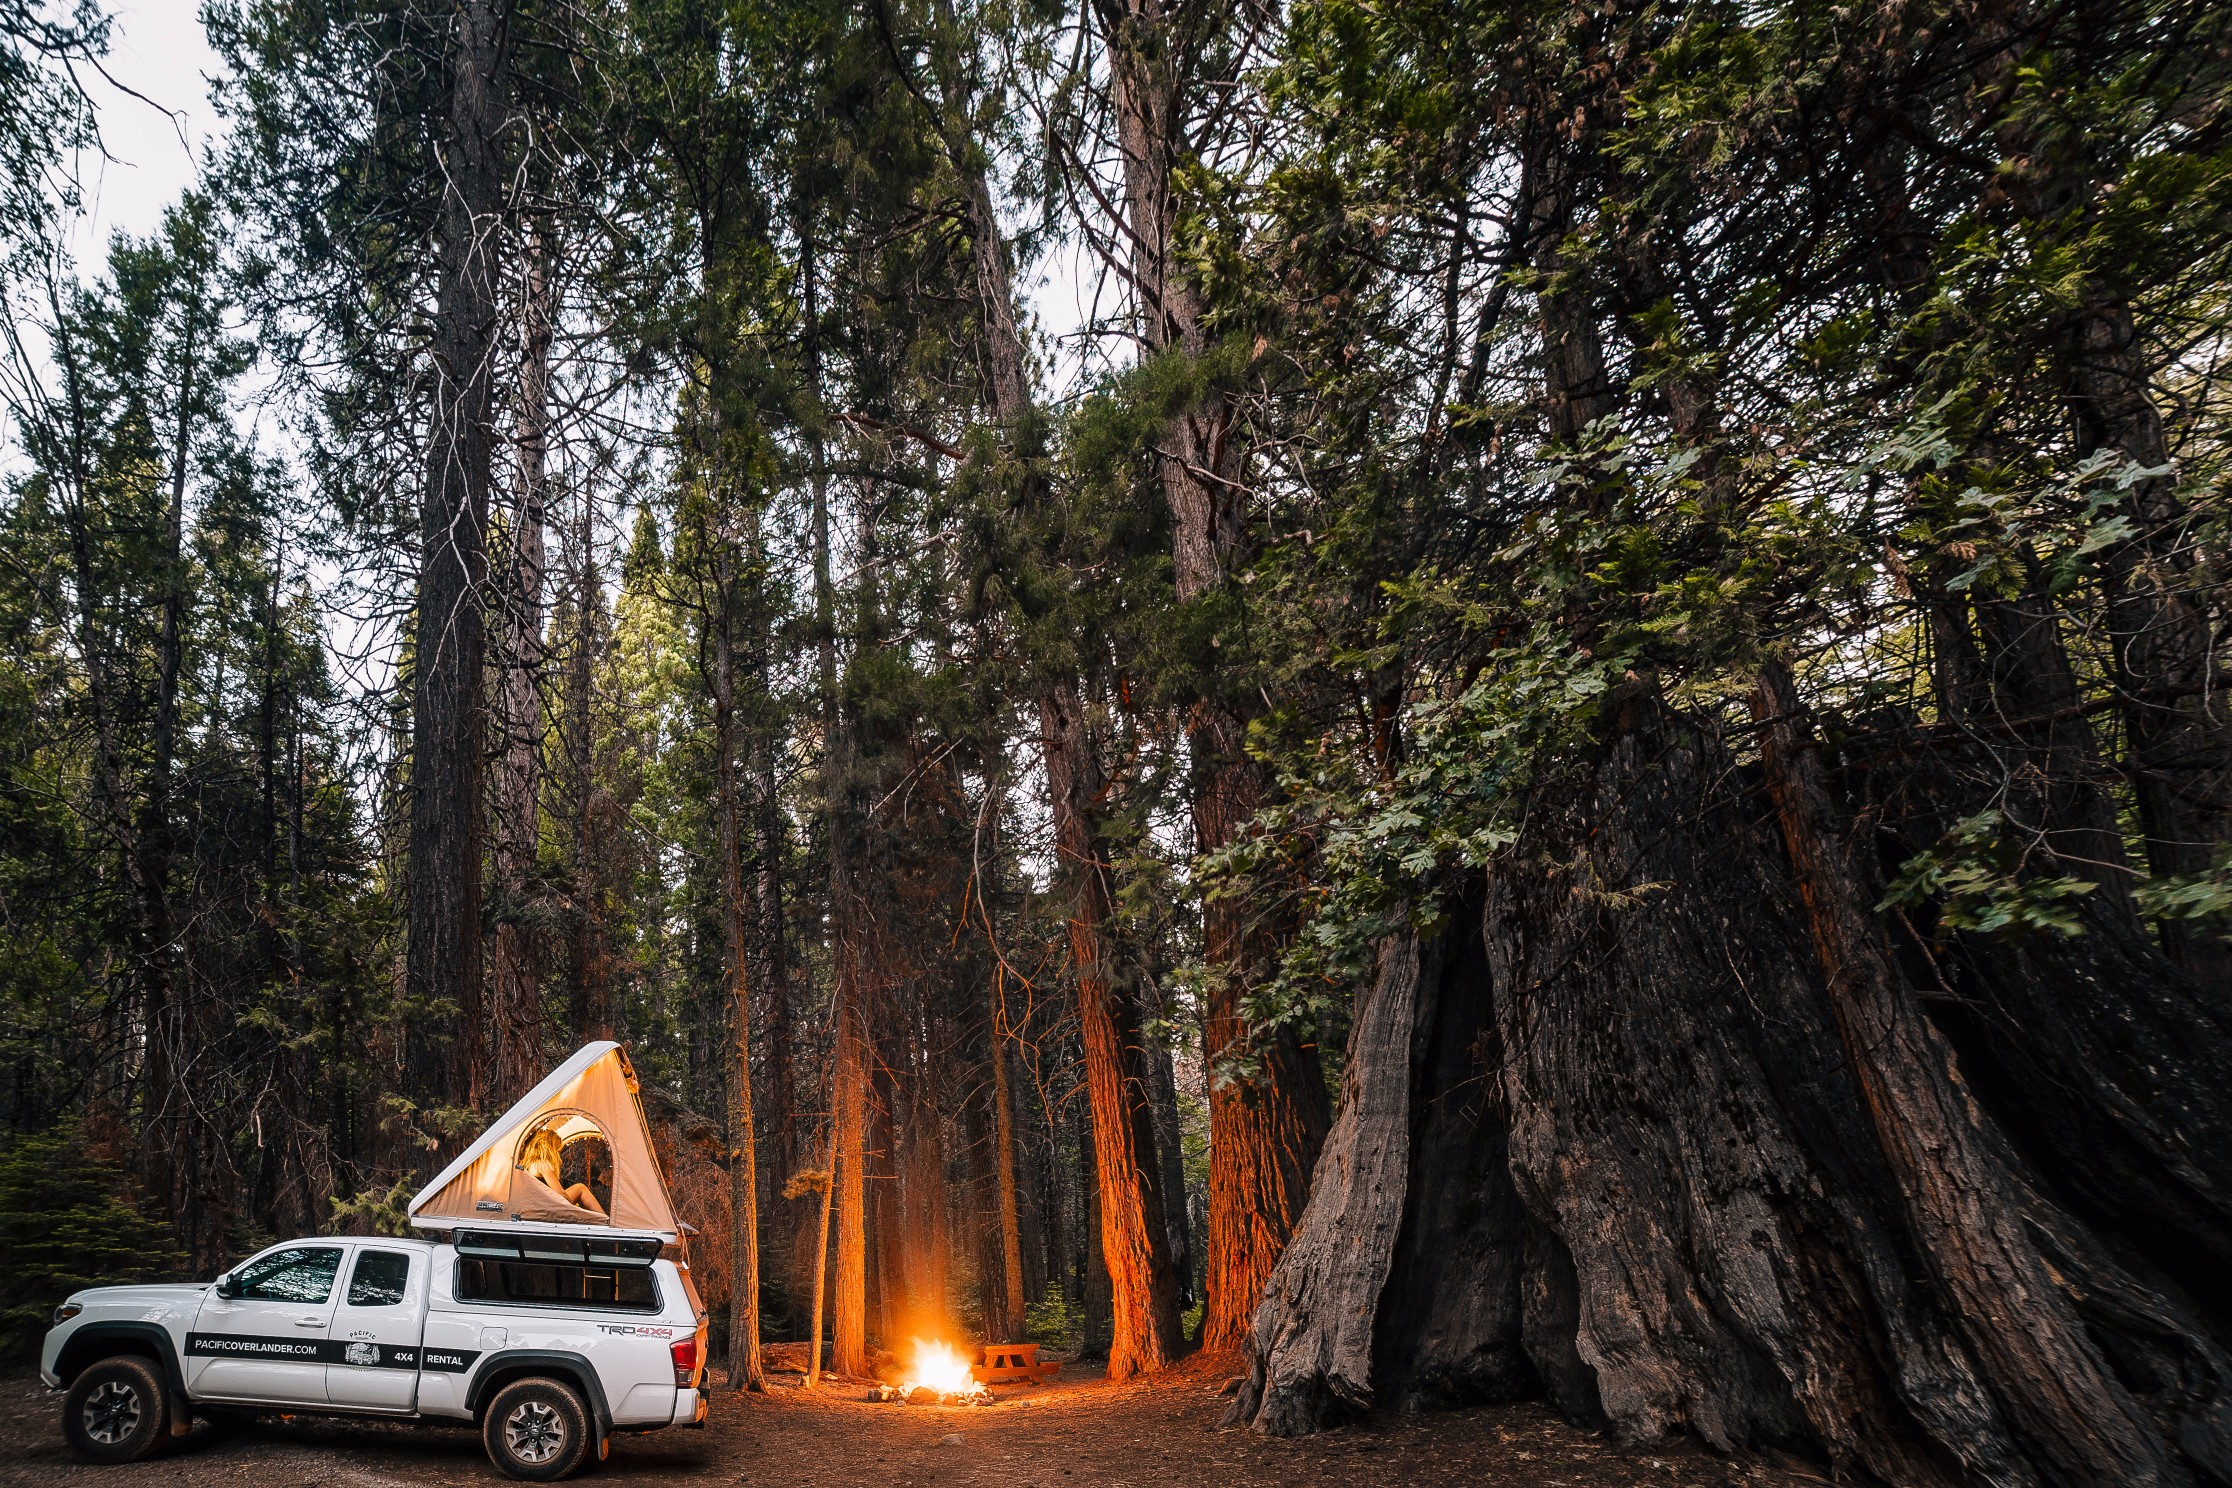 Sierra+national+forest+camping.jpg